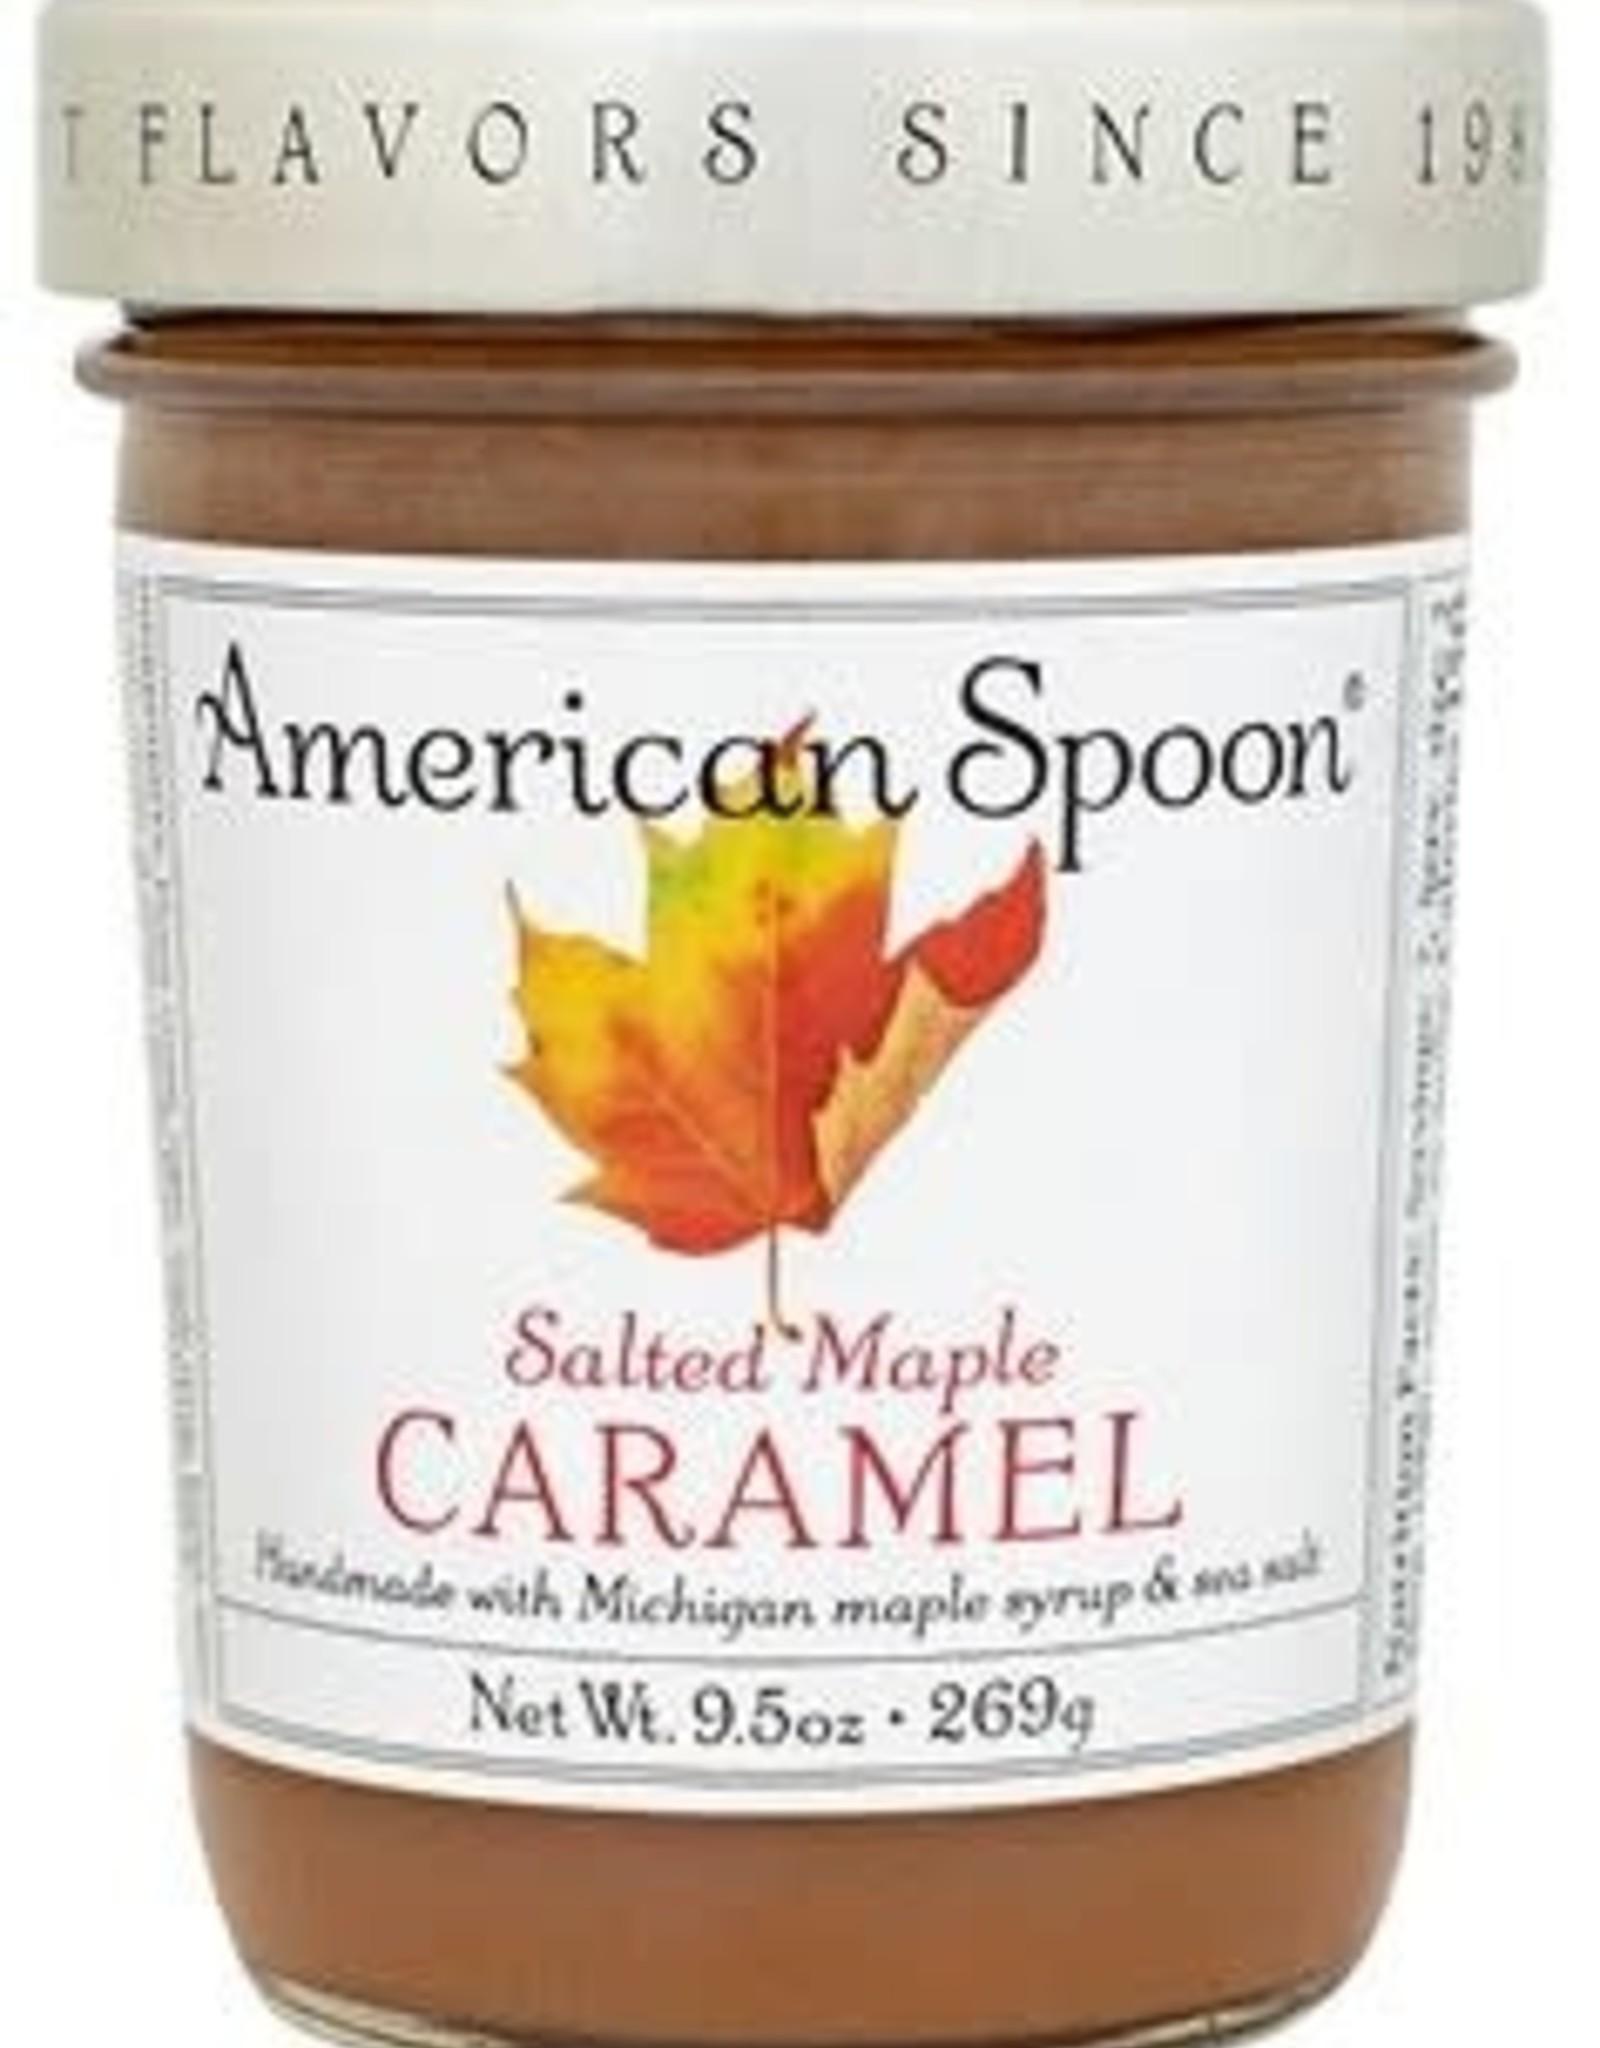 American Spoon AMERICAN SPOON SALTED MAPLE CARAMEL